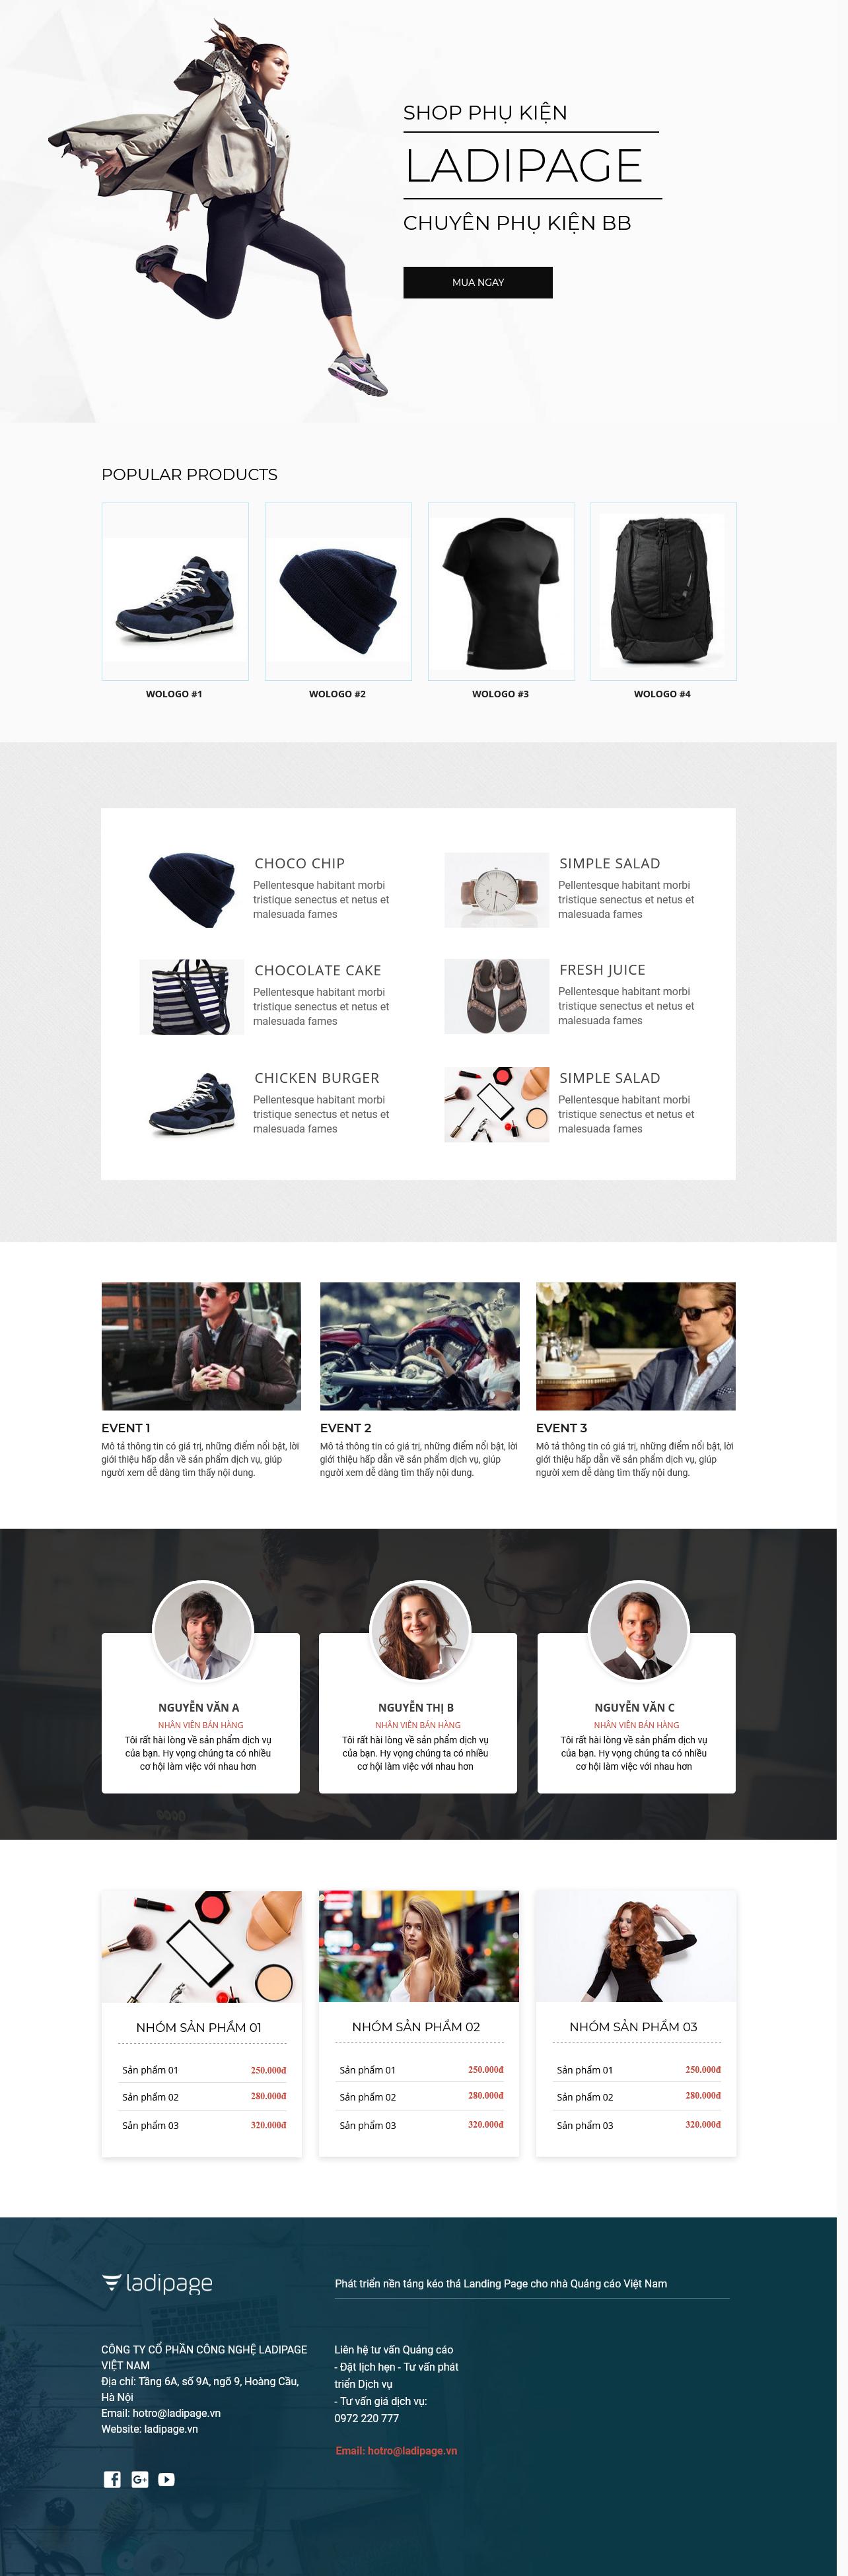 Thiết kế website Thiết kế webiste landingpage thoi-trang---phu-kien Thời trang phụ kiện 10